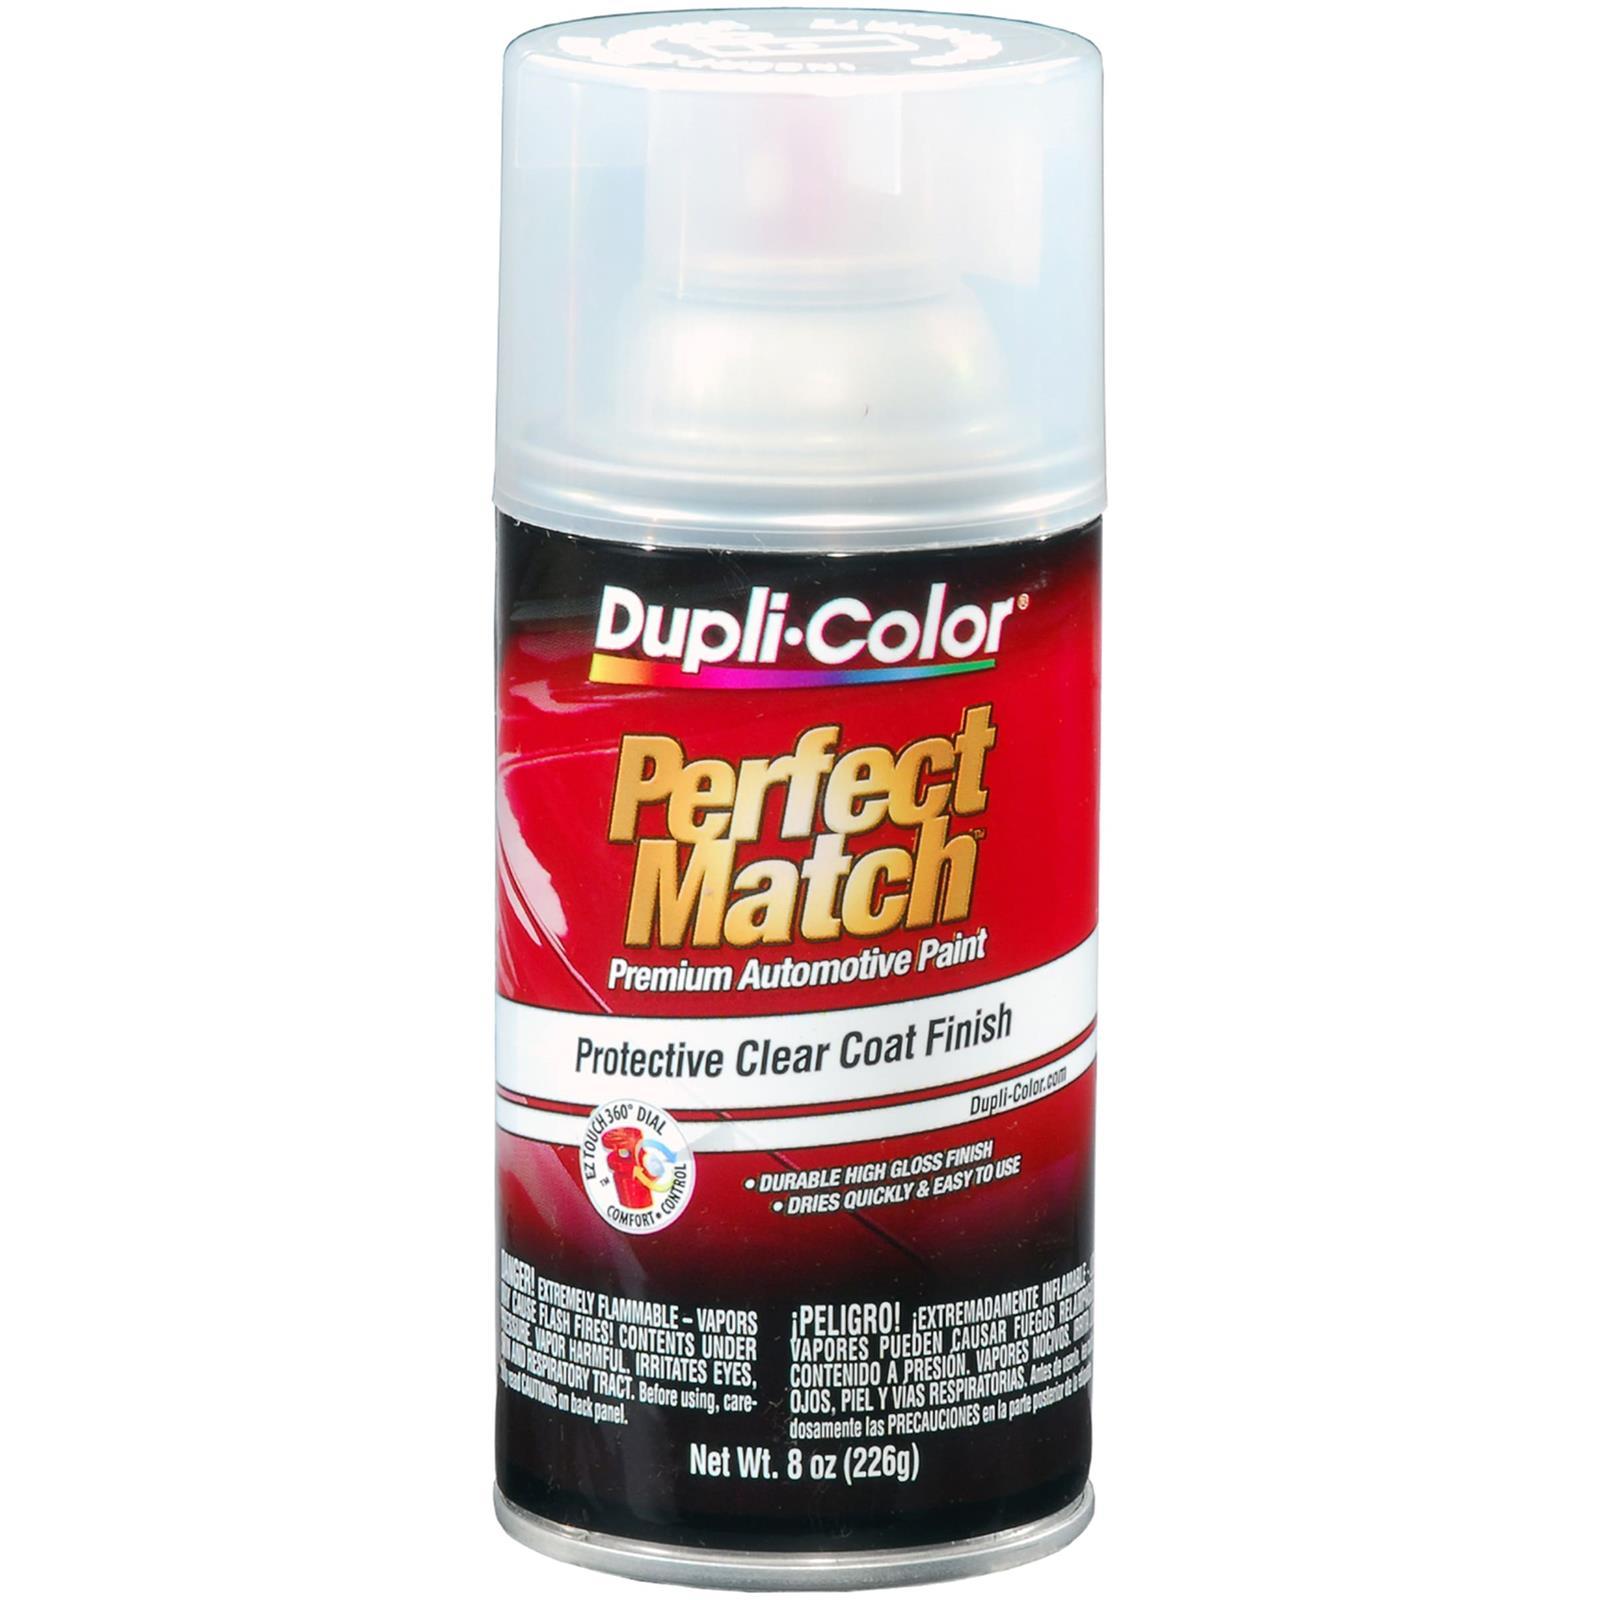 details about dupli color perfect match paint bcl0125. Black Bedroom Furniture Sets. Home Design Ideas